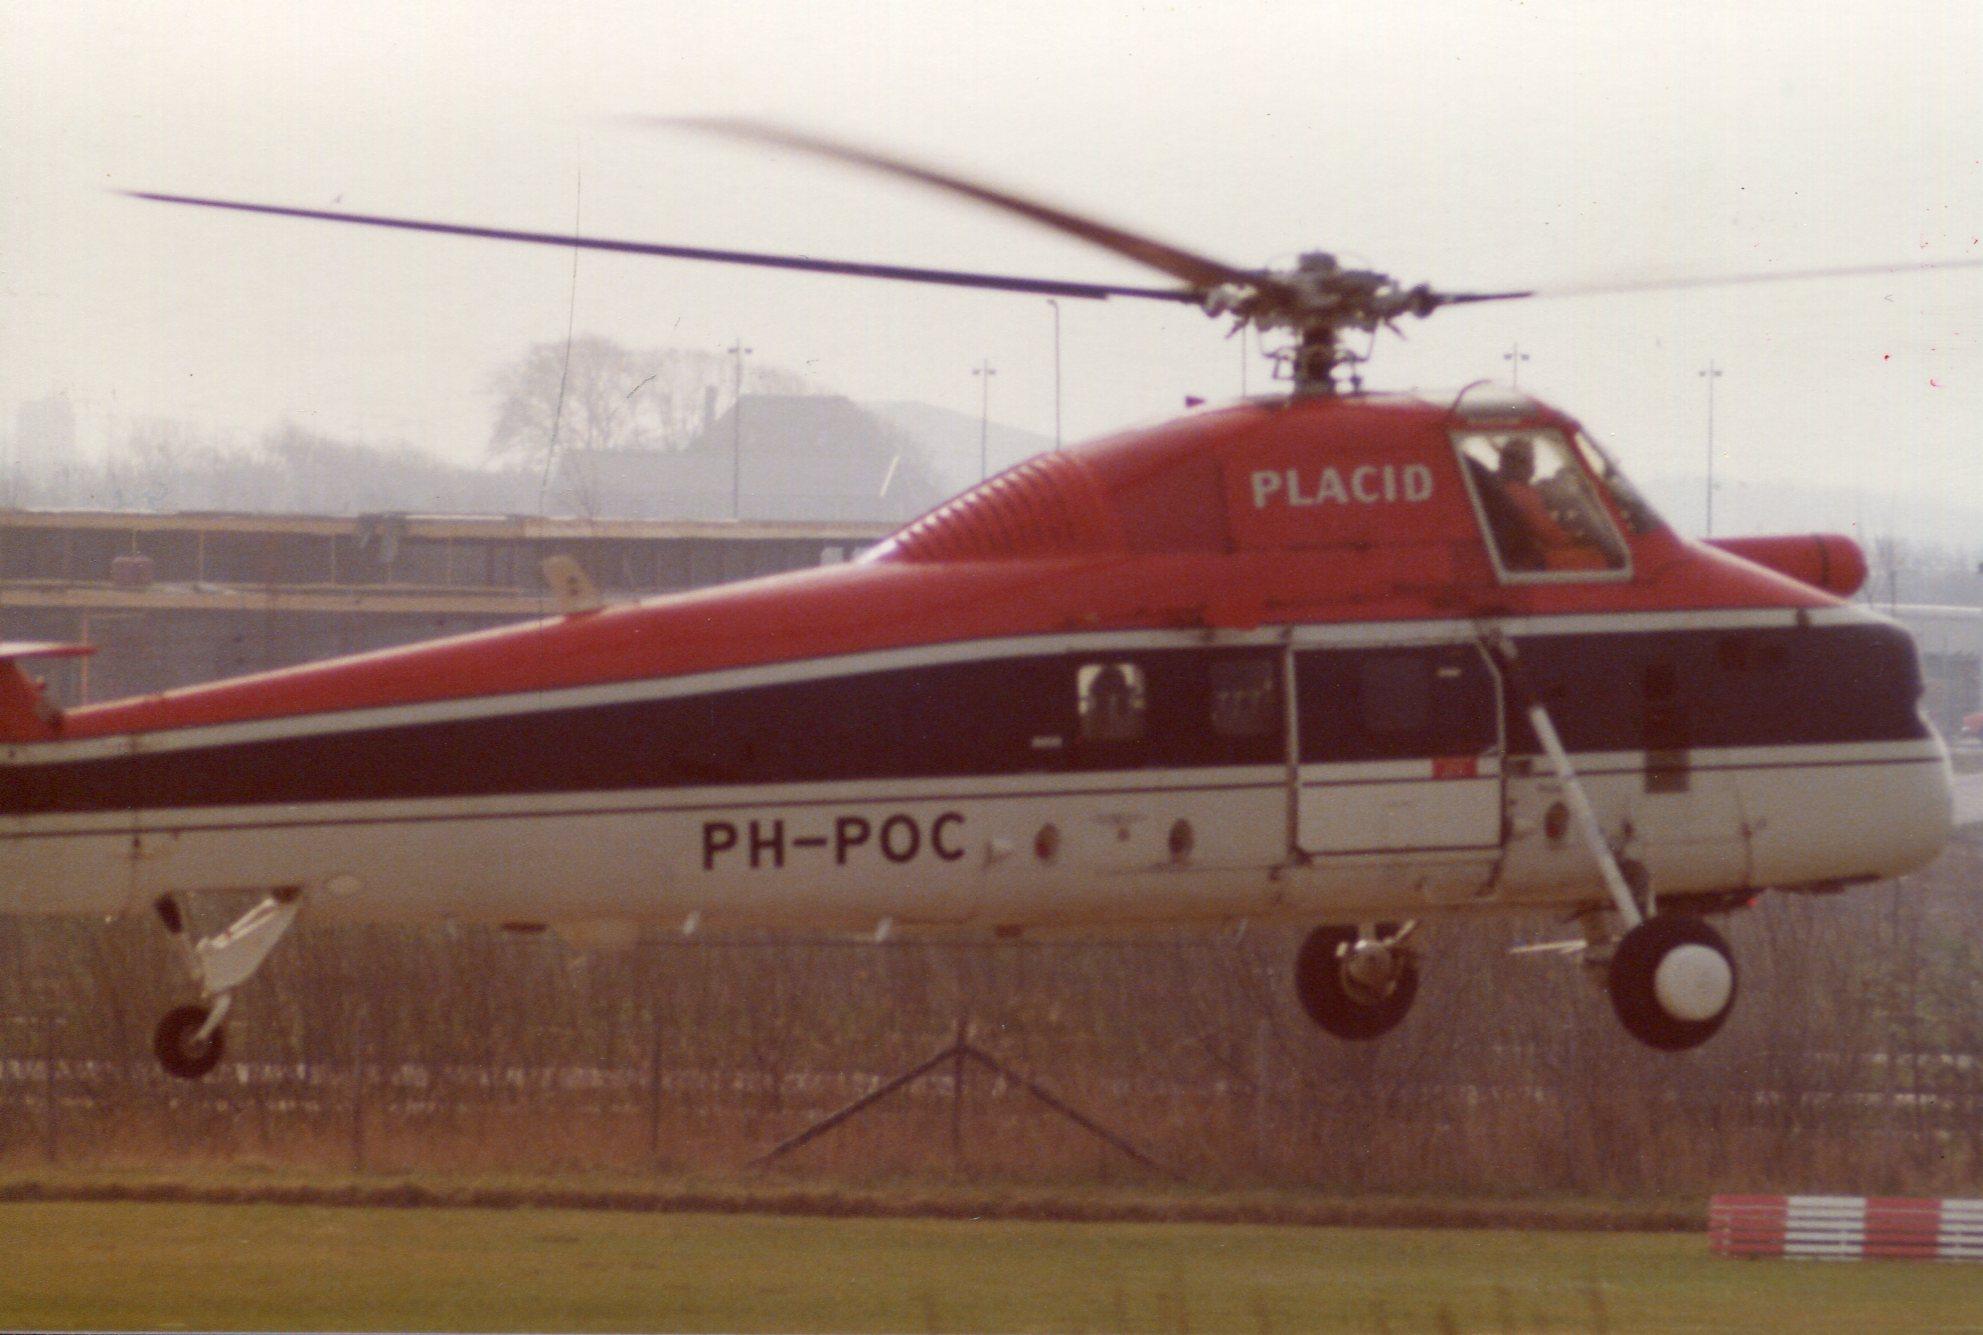 Naam: Den Helder , april 1977.jpg Bekeken: 243 Grootte: 279,4 KB